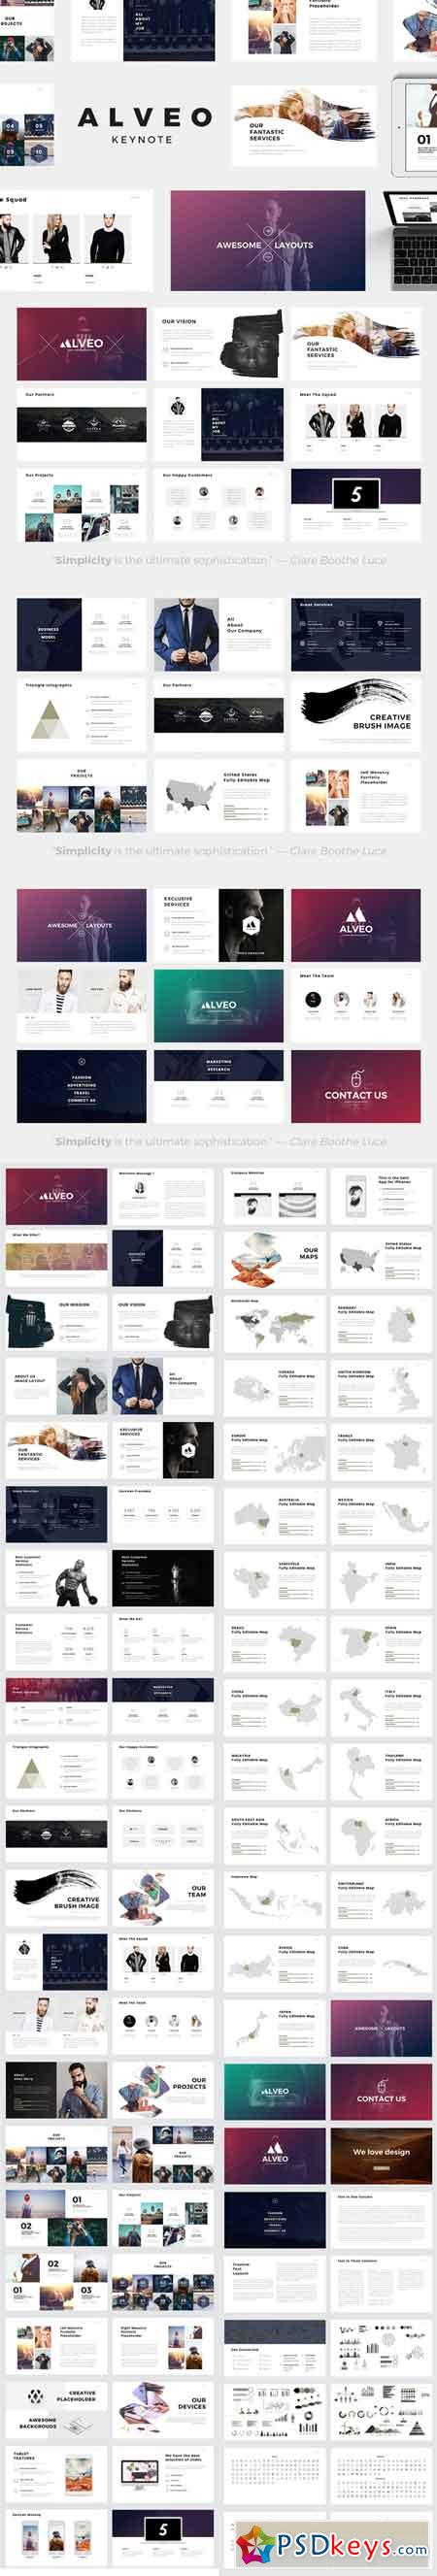 alveo minimal keynote template 625856 free download photoshop vector stock image via torrent. Black Bedroom Furniture Sets. Home Design Ideas